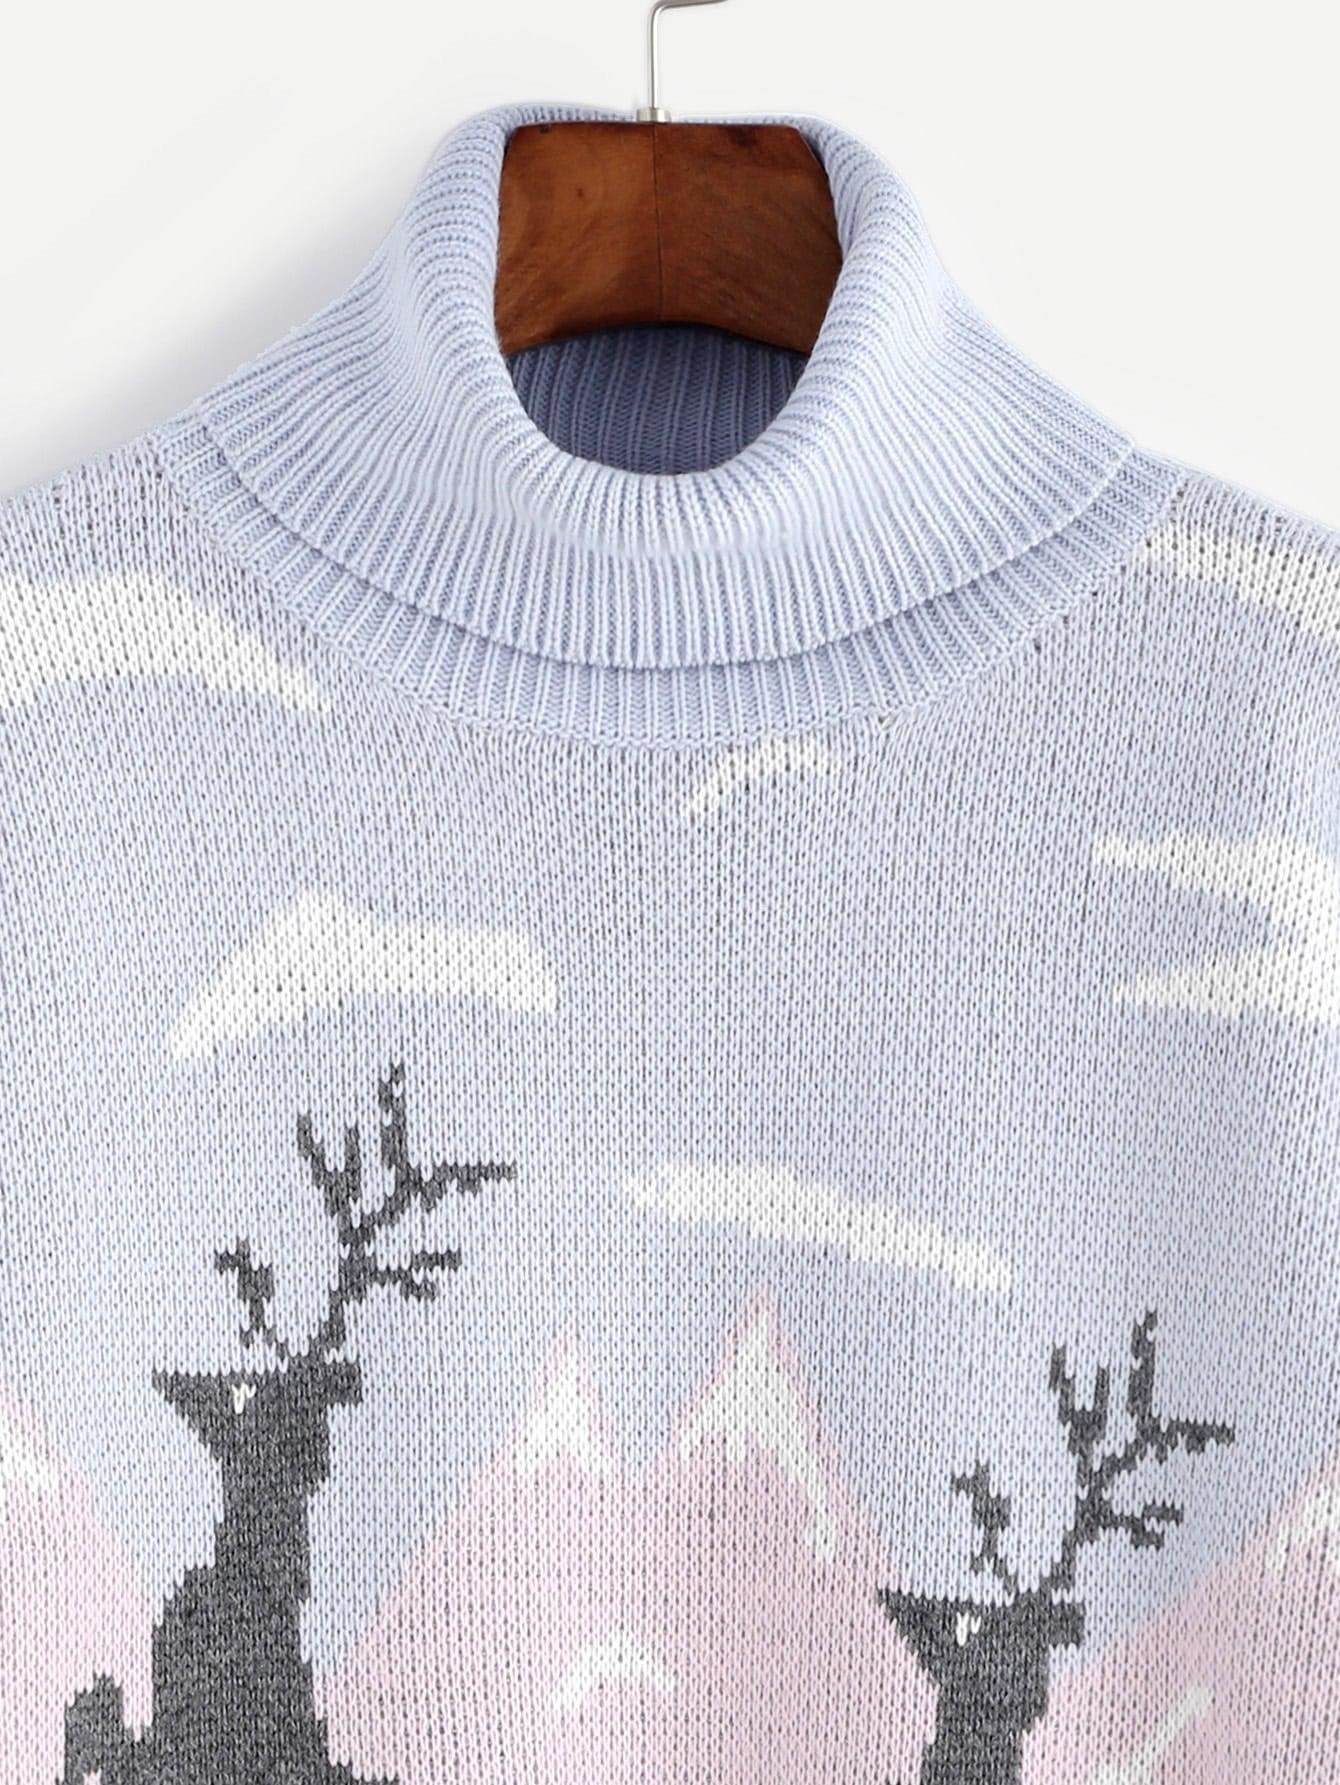 sweater161021457_2